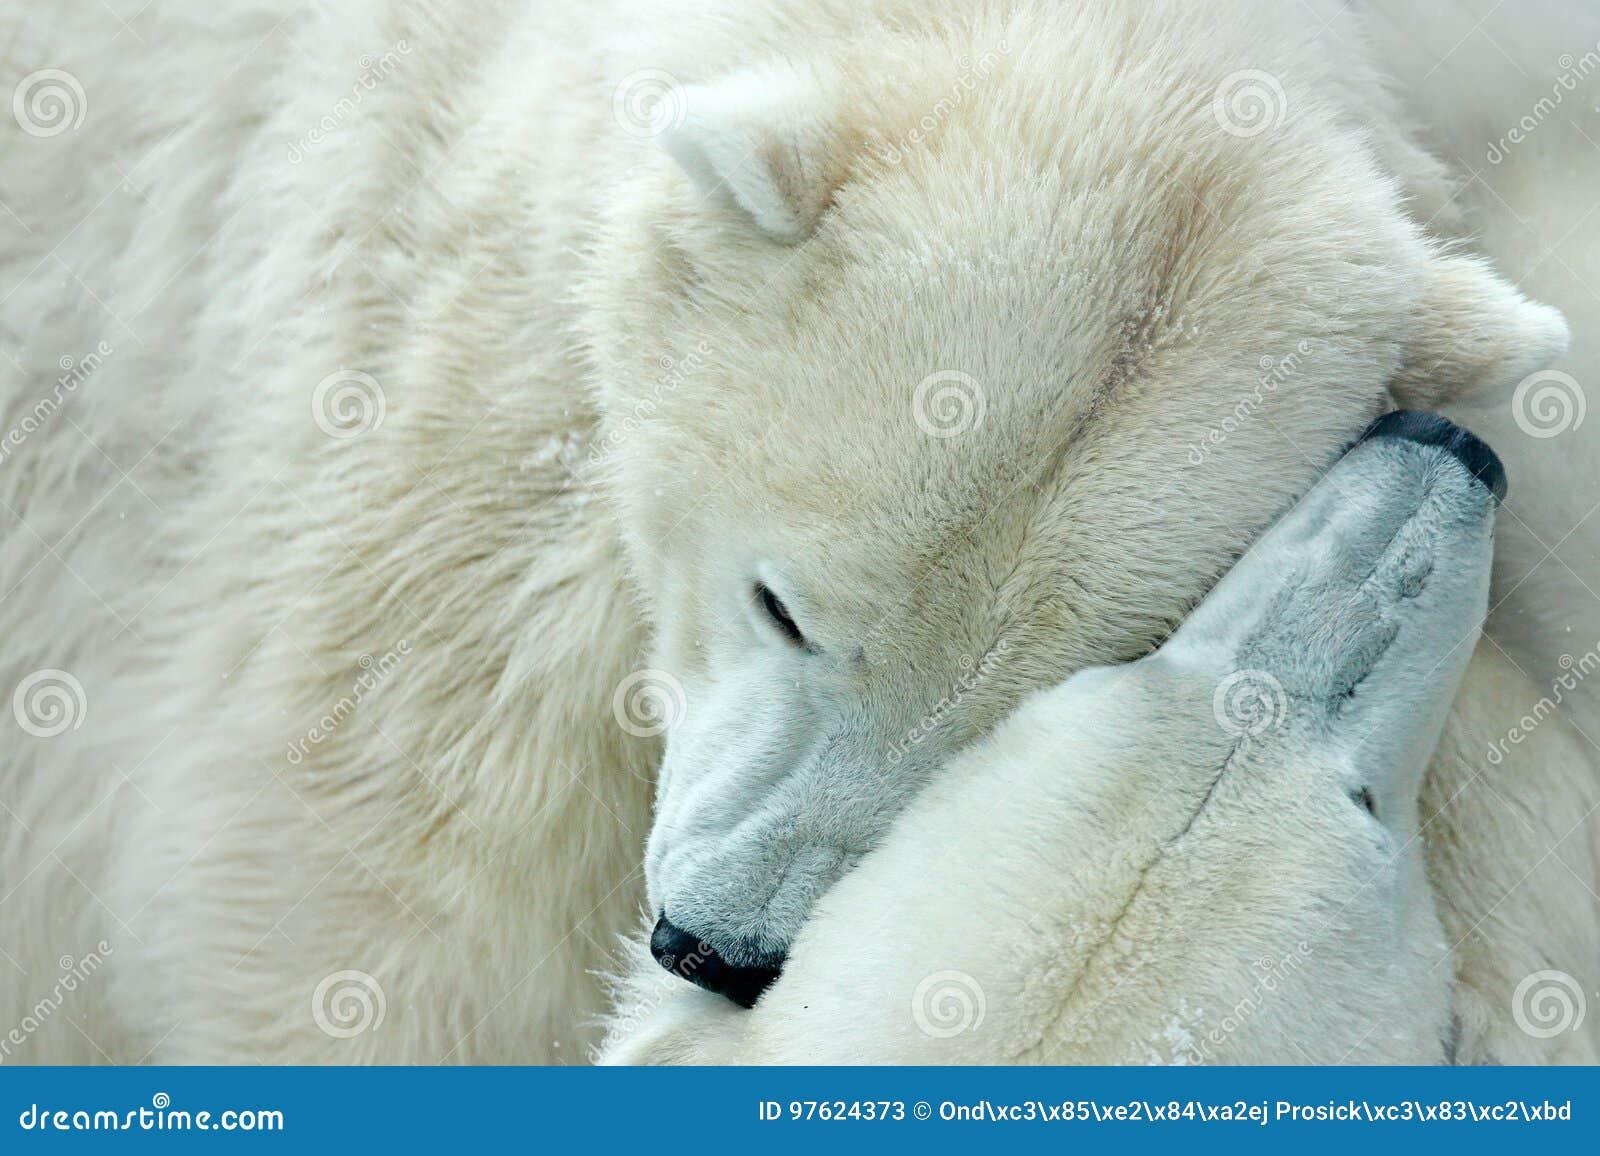 Oso polar dos que lucha en el hielo de deriva en Svalbard ártico Detalle de la lucha Animal peligroso grande del ártico Cabeza do